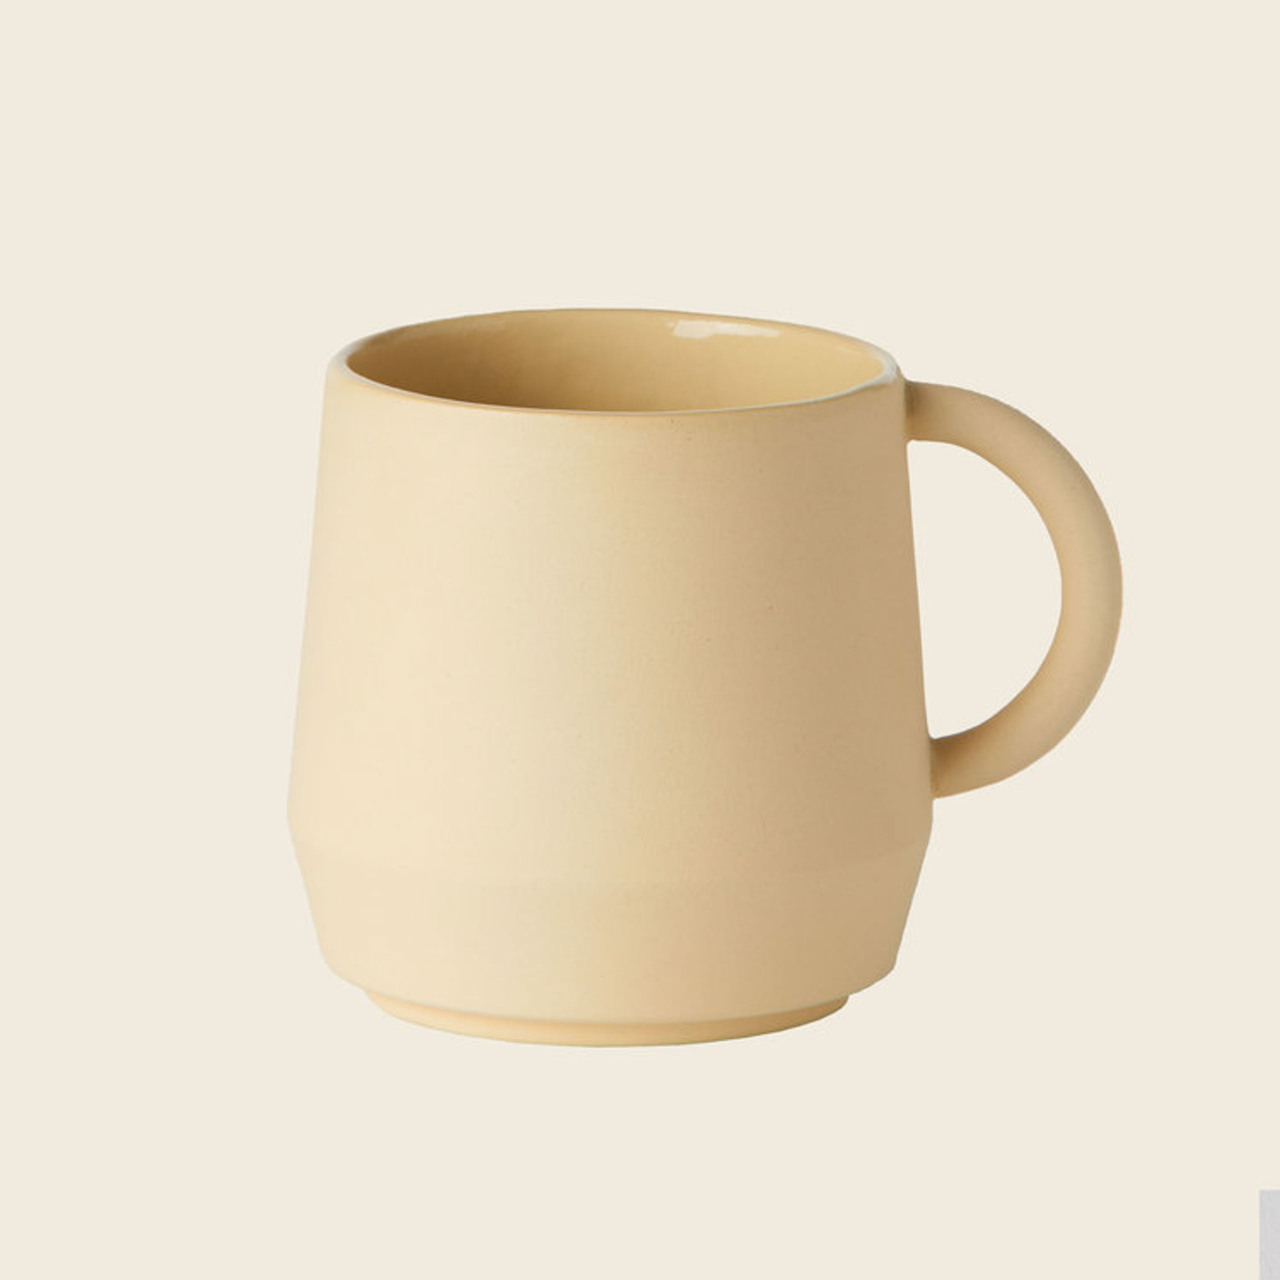 Schneid Cup Keramik, Gelb